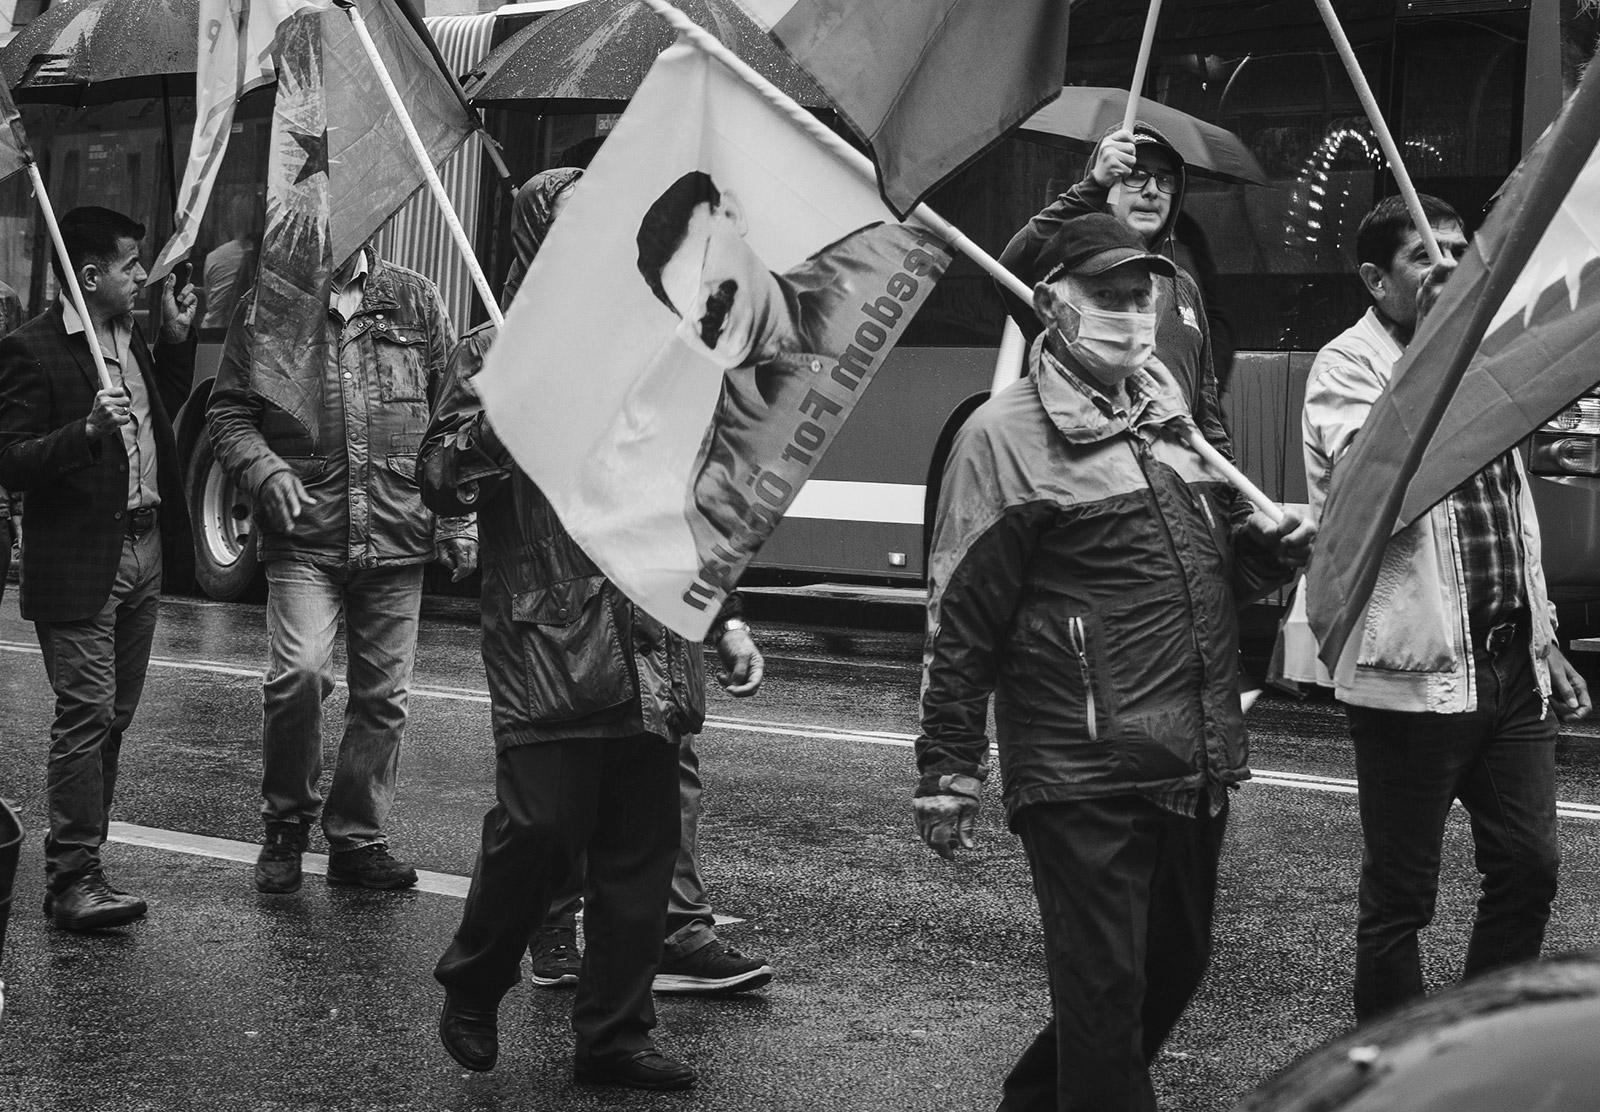 Protester in mask